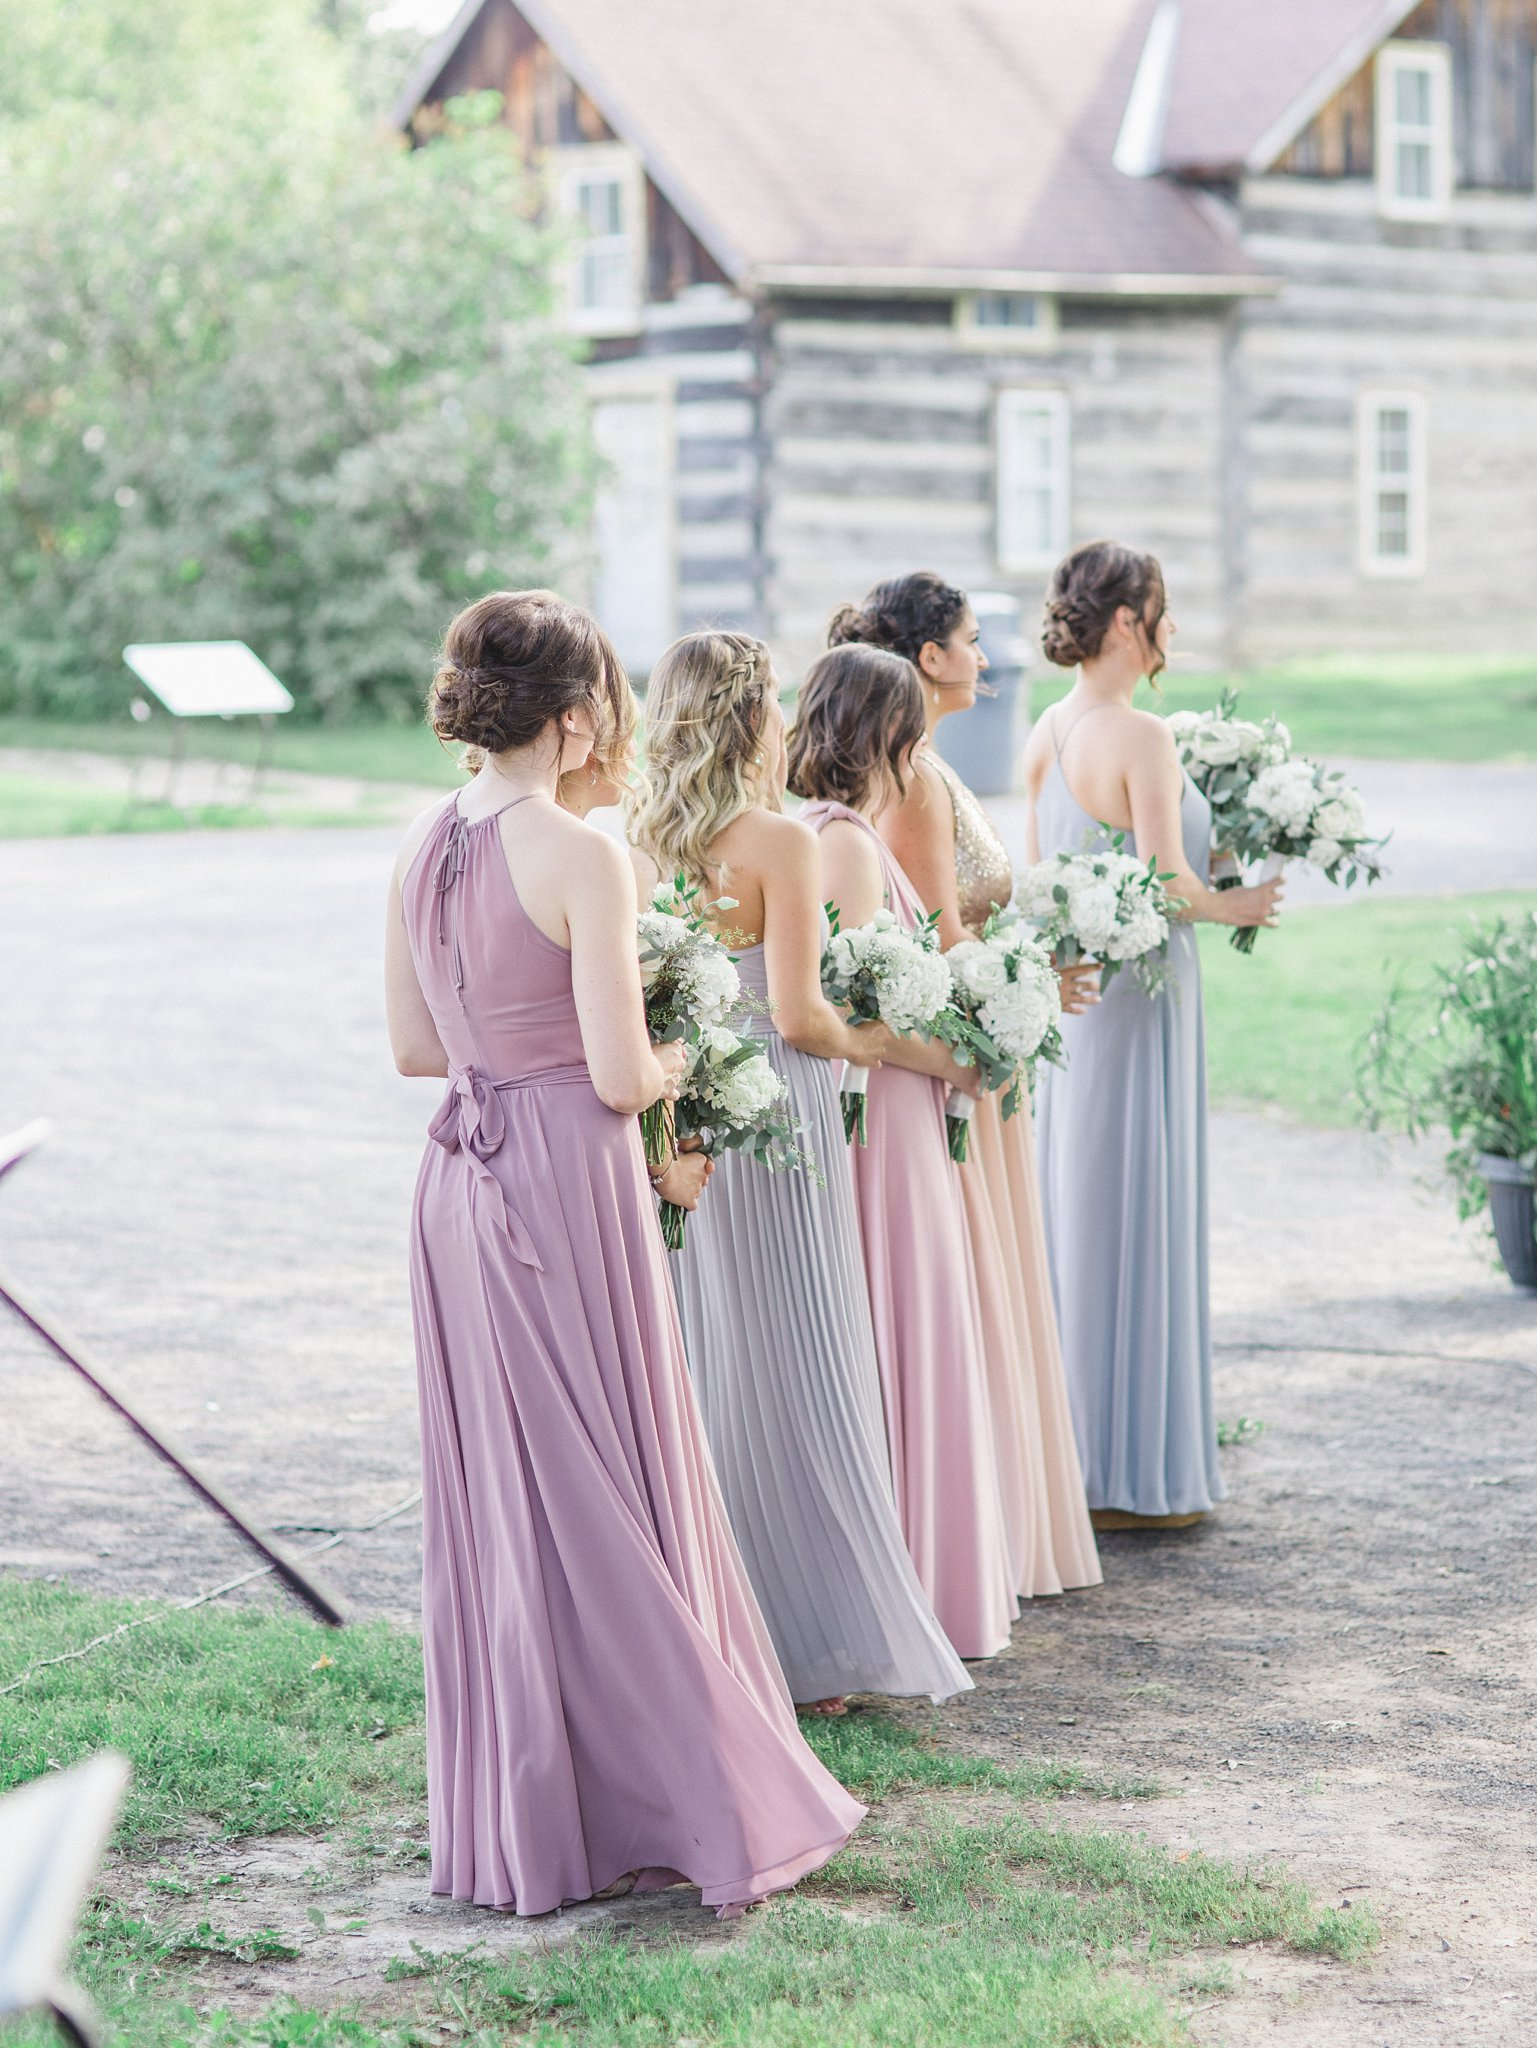 Bridesmaids at Outdoor wedding at Cumberland Heritage Museum Amy Pinder Photography